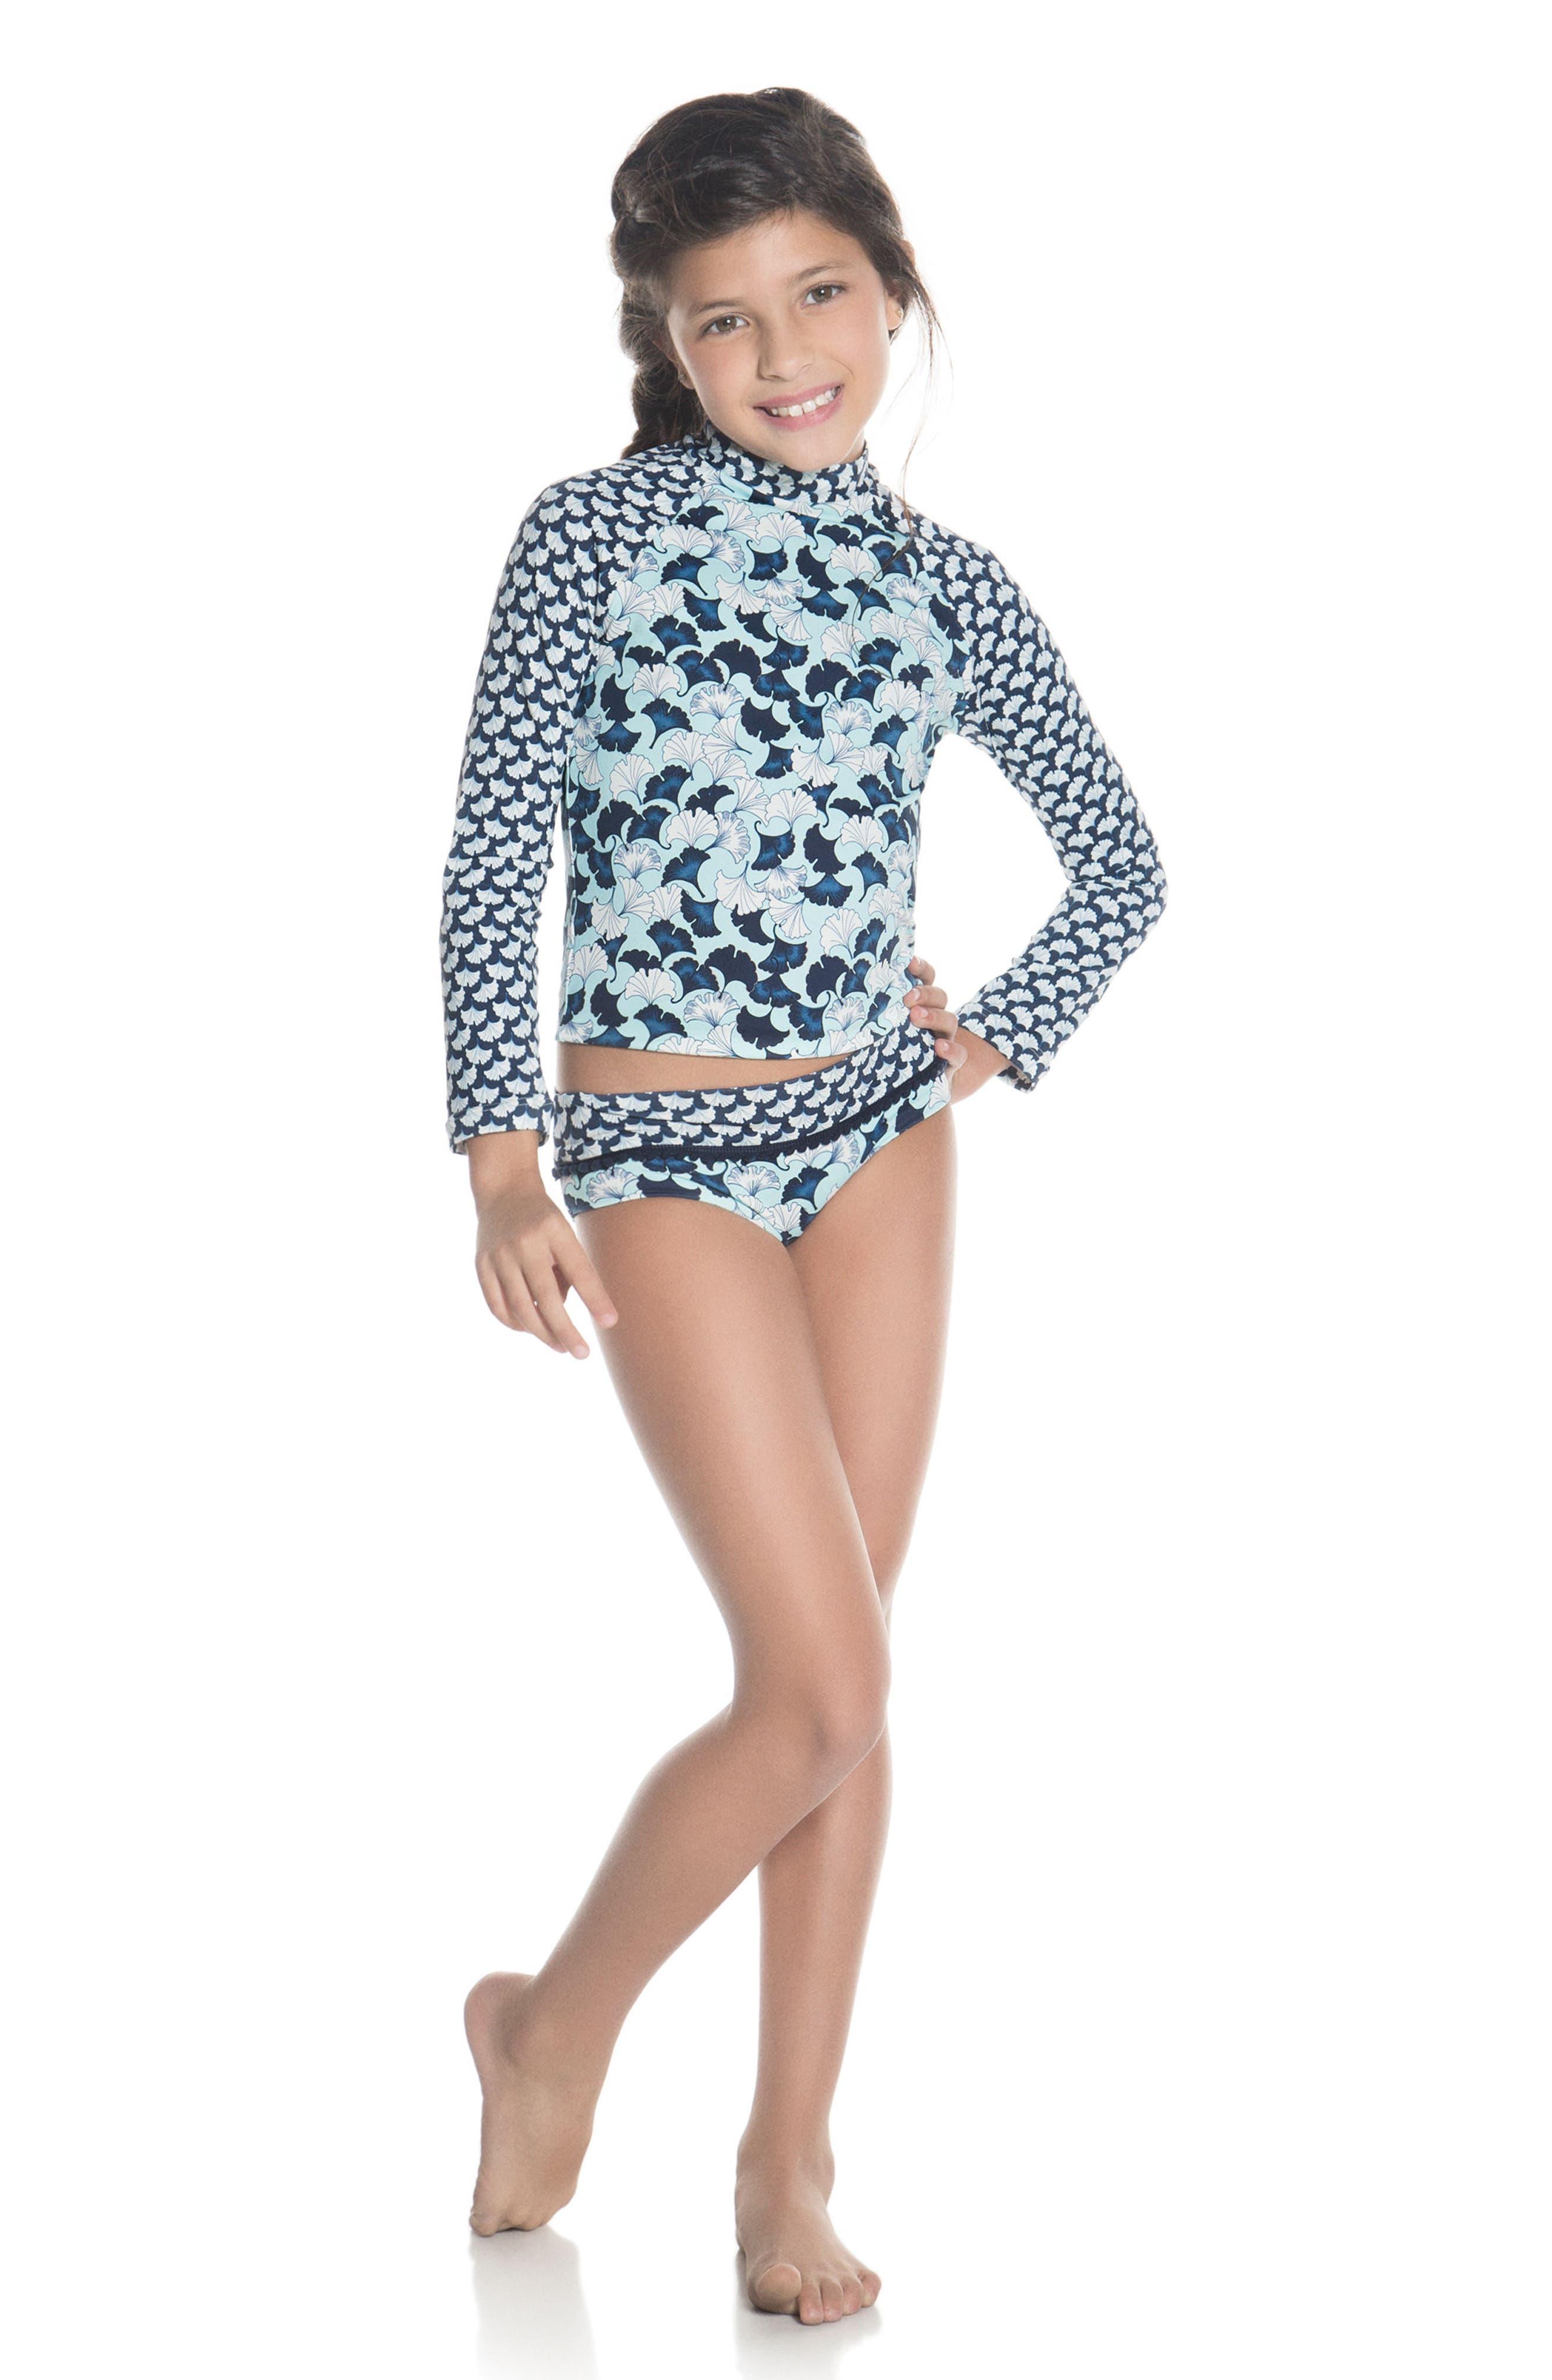 Lotto Two-Piece Rashguard Swimsuit,                             Alternate thumbnail 3, color,                             400